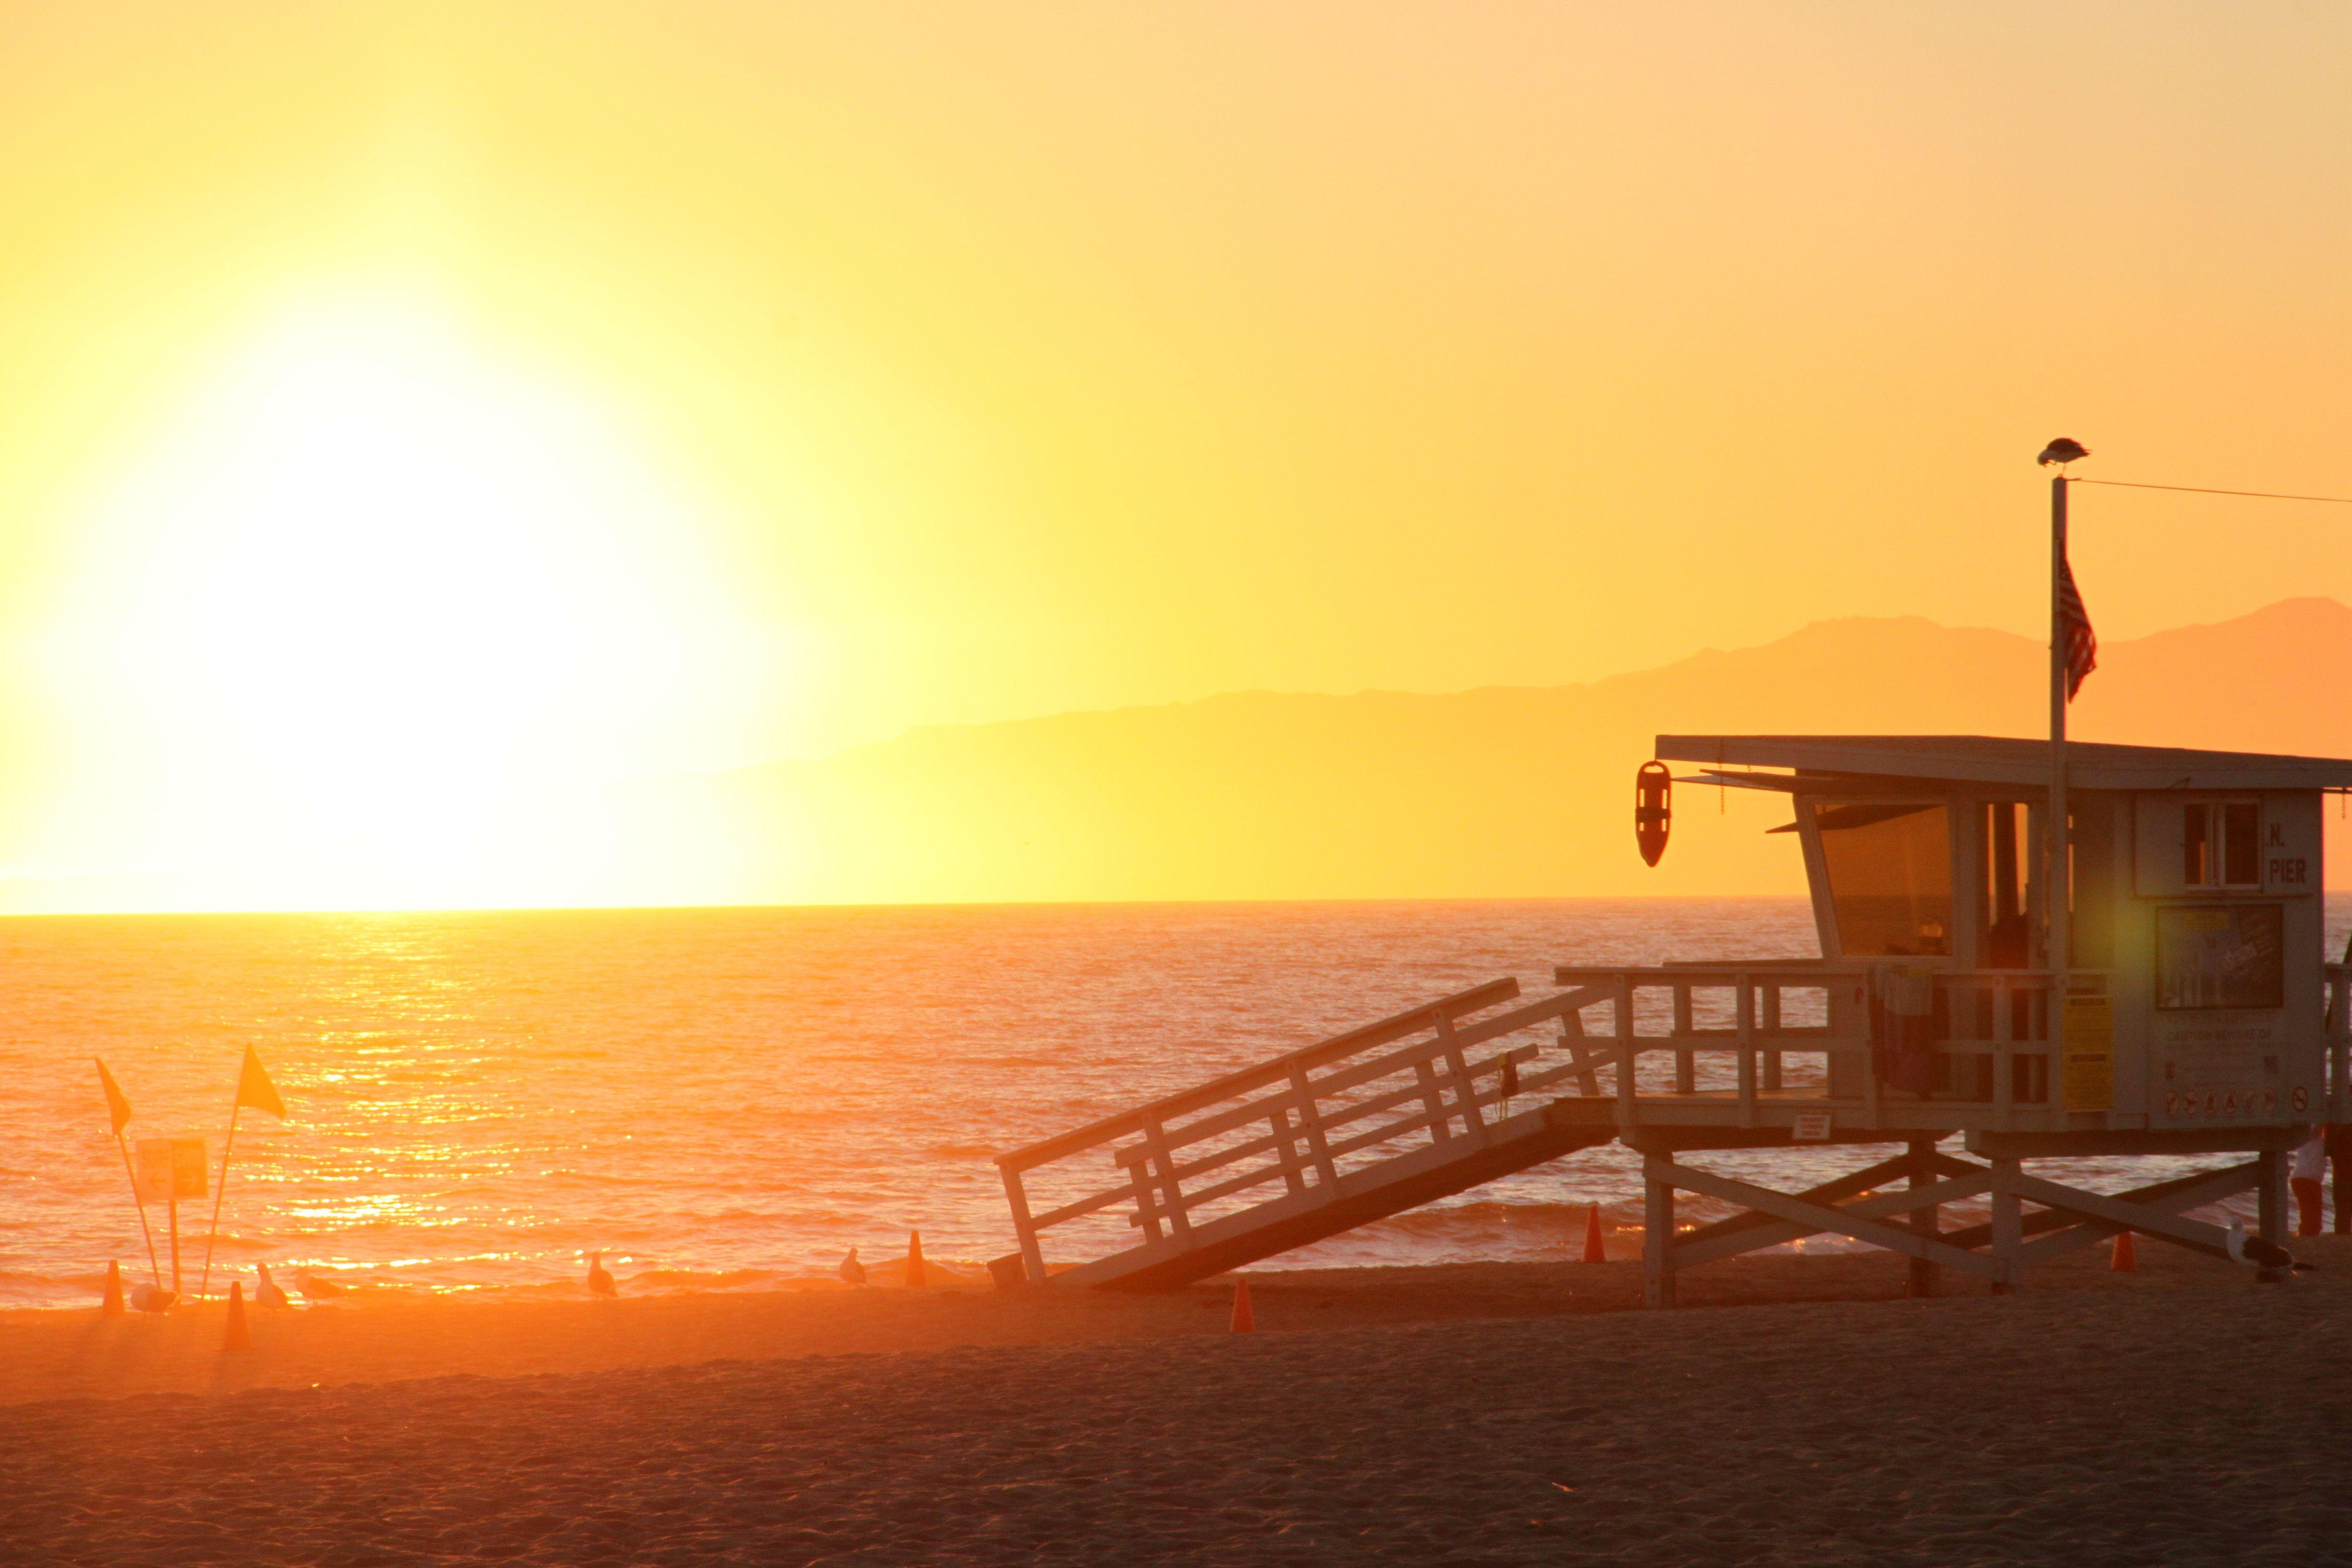 Lake tahoe sunset travel channel pinterest - Sunset At Venice Beach California La Travel California